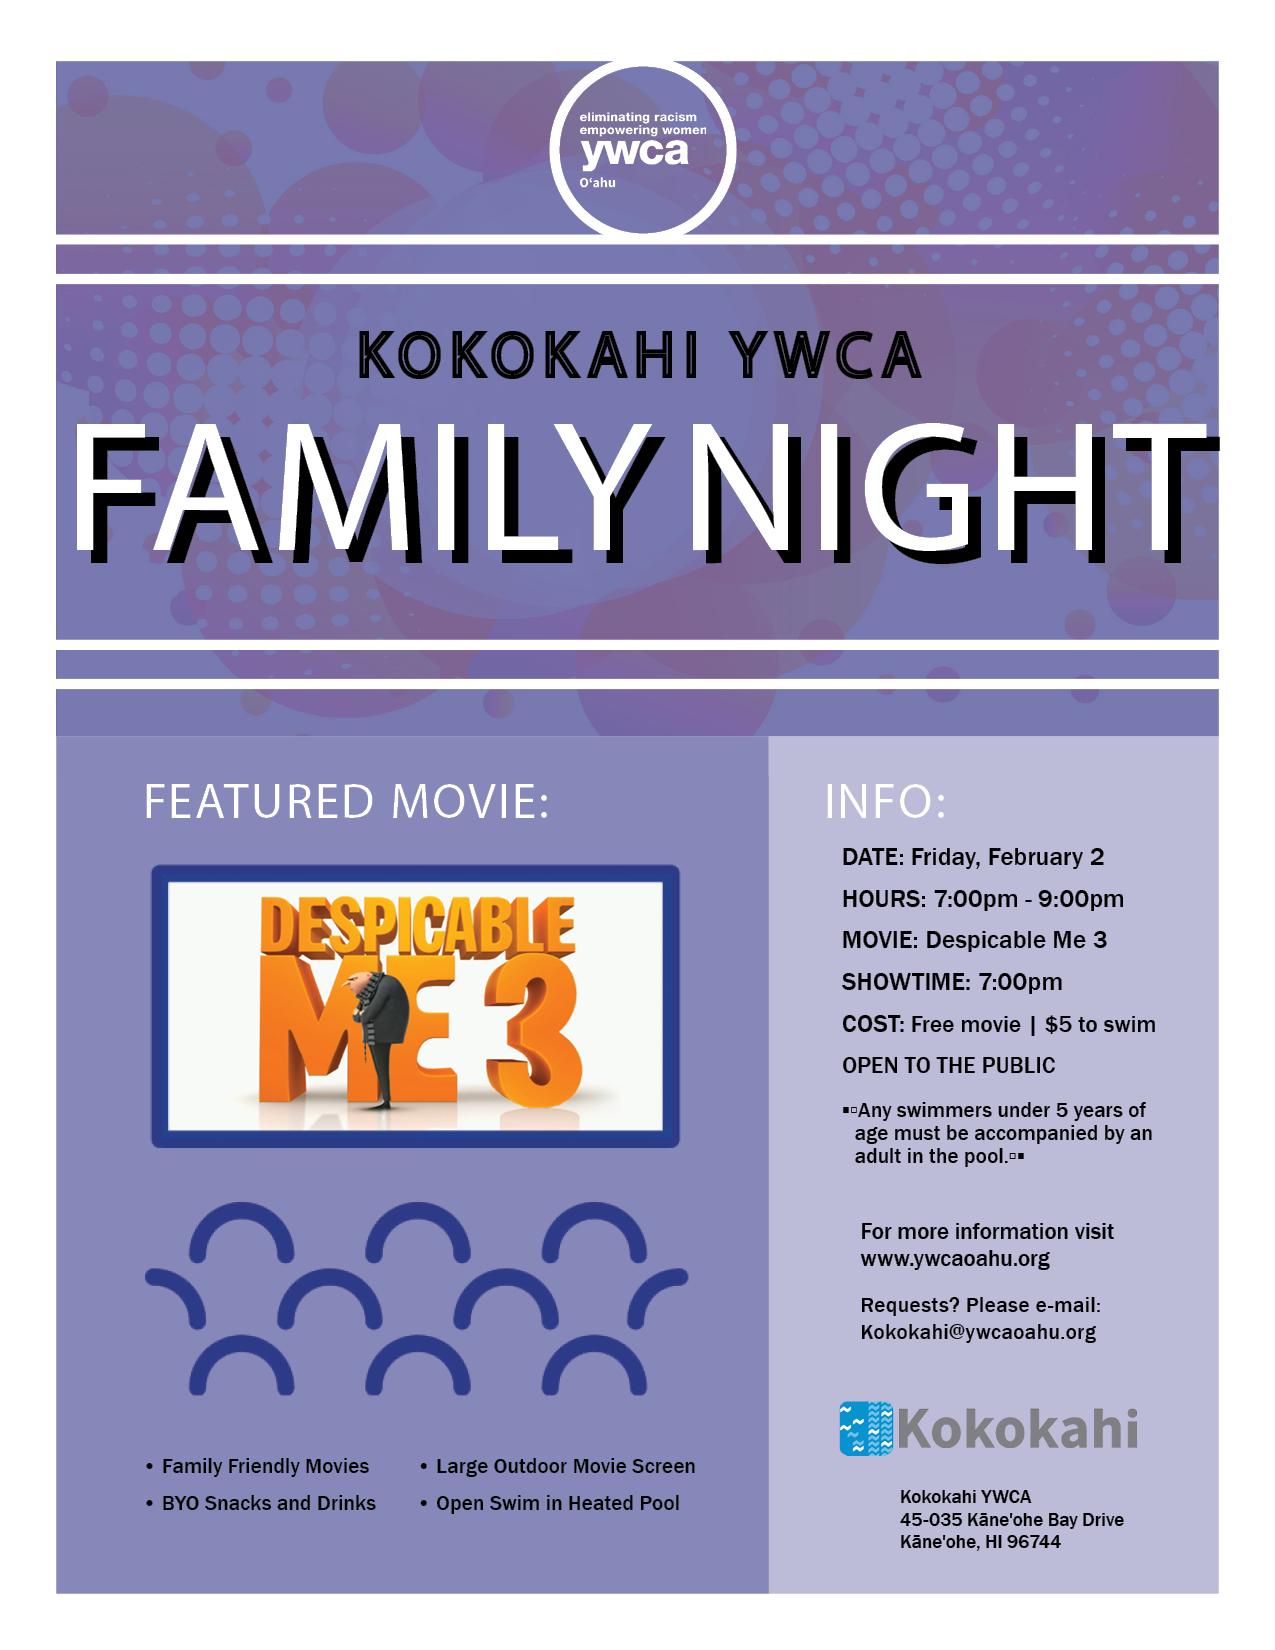 Kokokahi Family Night flyer 2018 Feb.png